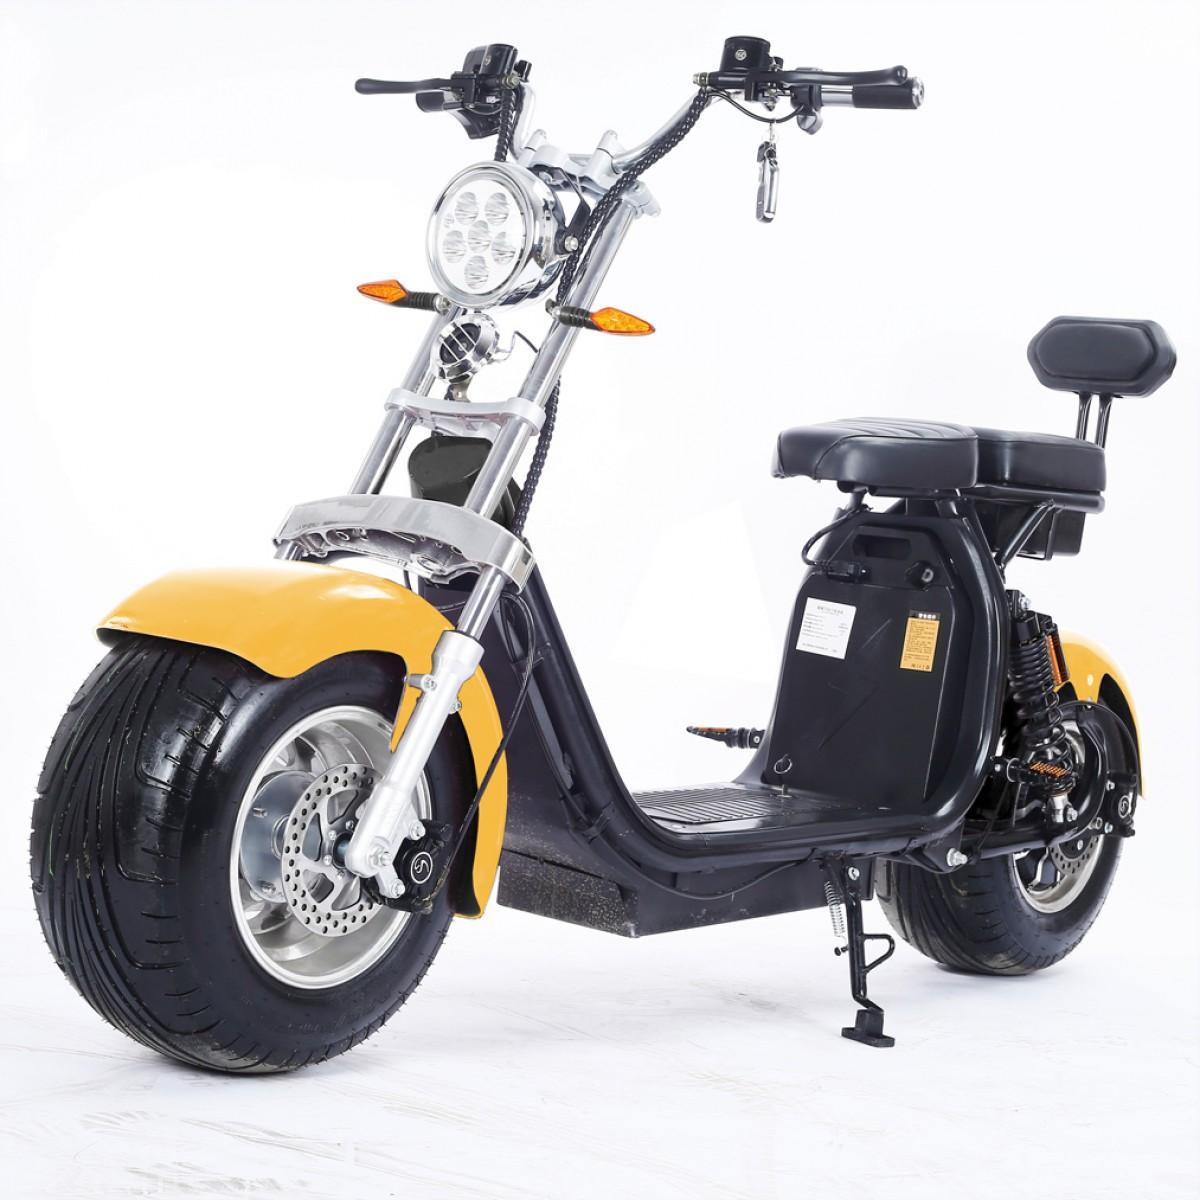 Moto Elétrica RideMode ECO 1500w, Aluminium, Yellow, EM-04-BY